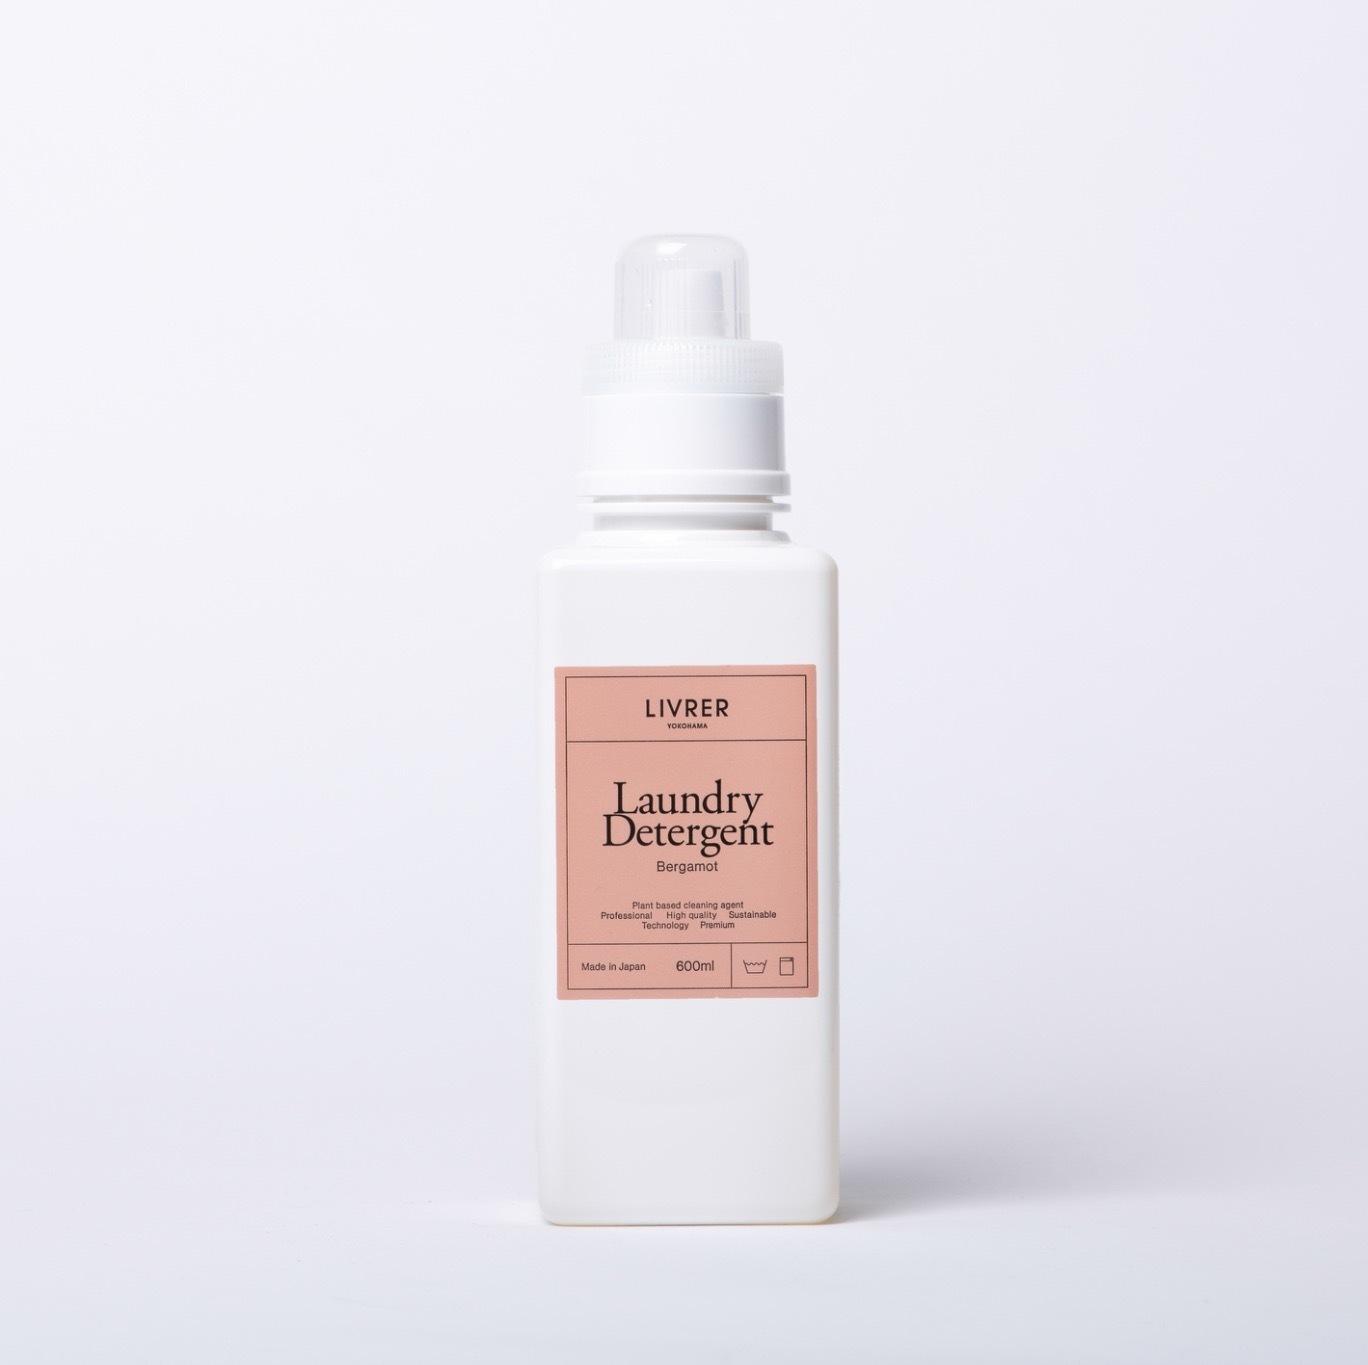 600ml】ベルガモット 洗濯用洗剤 /Landry Detergent ▶Bergamot <綿、麻、合成繊維用>